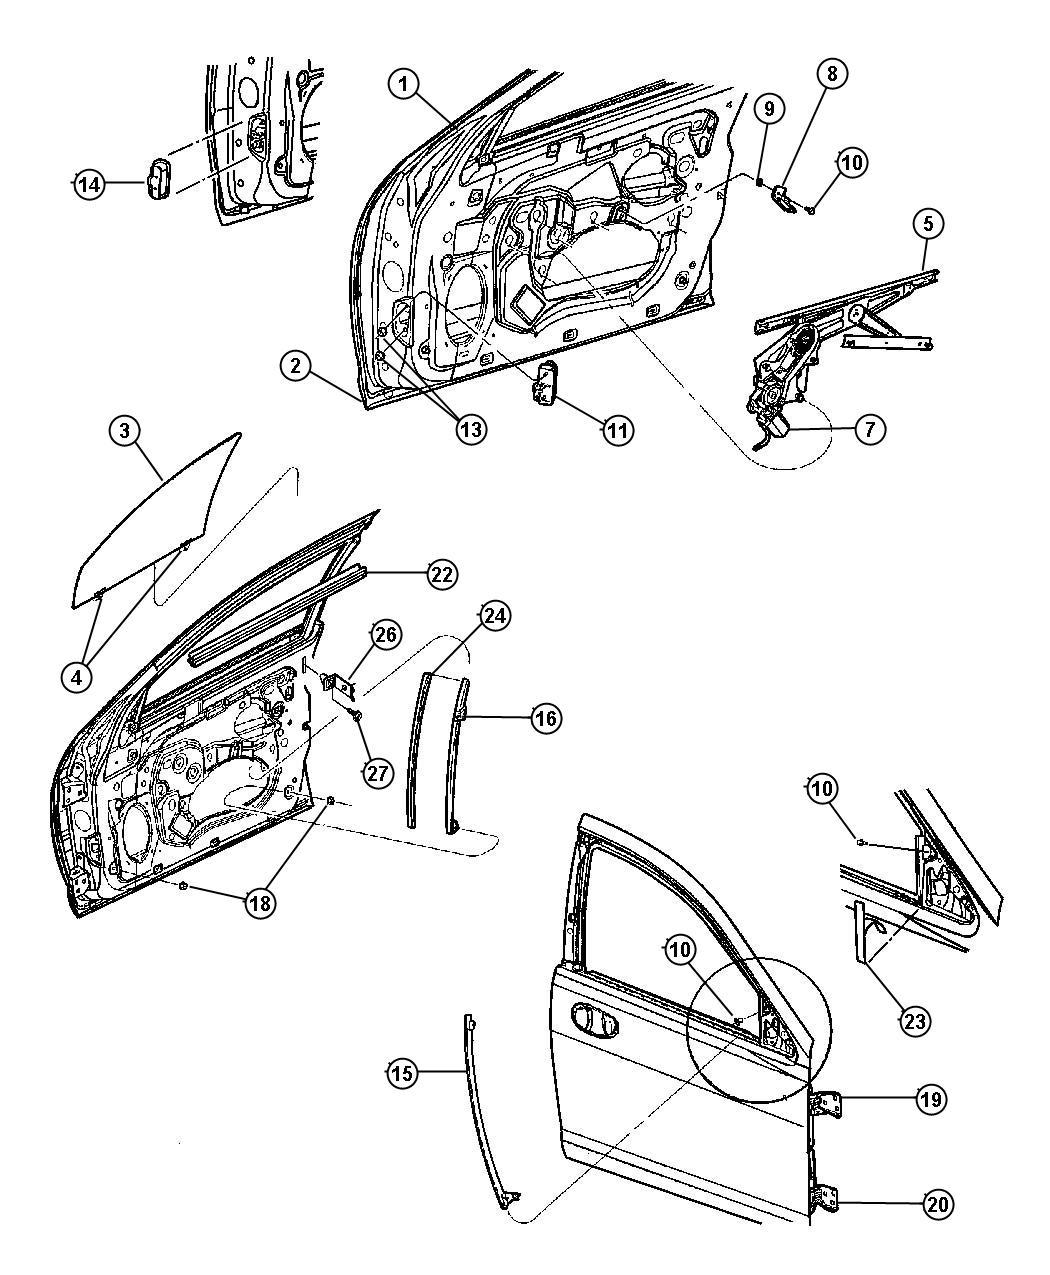 2004 chrysler sebring engine diagram msd 7al2 plus wiring 2001 car interior design